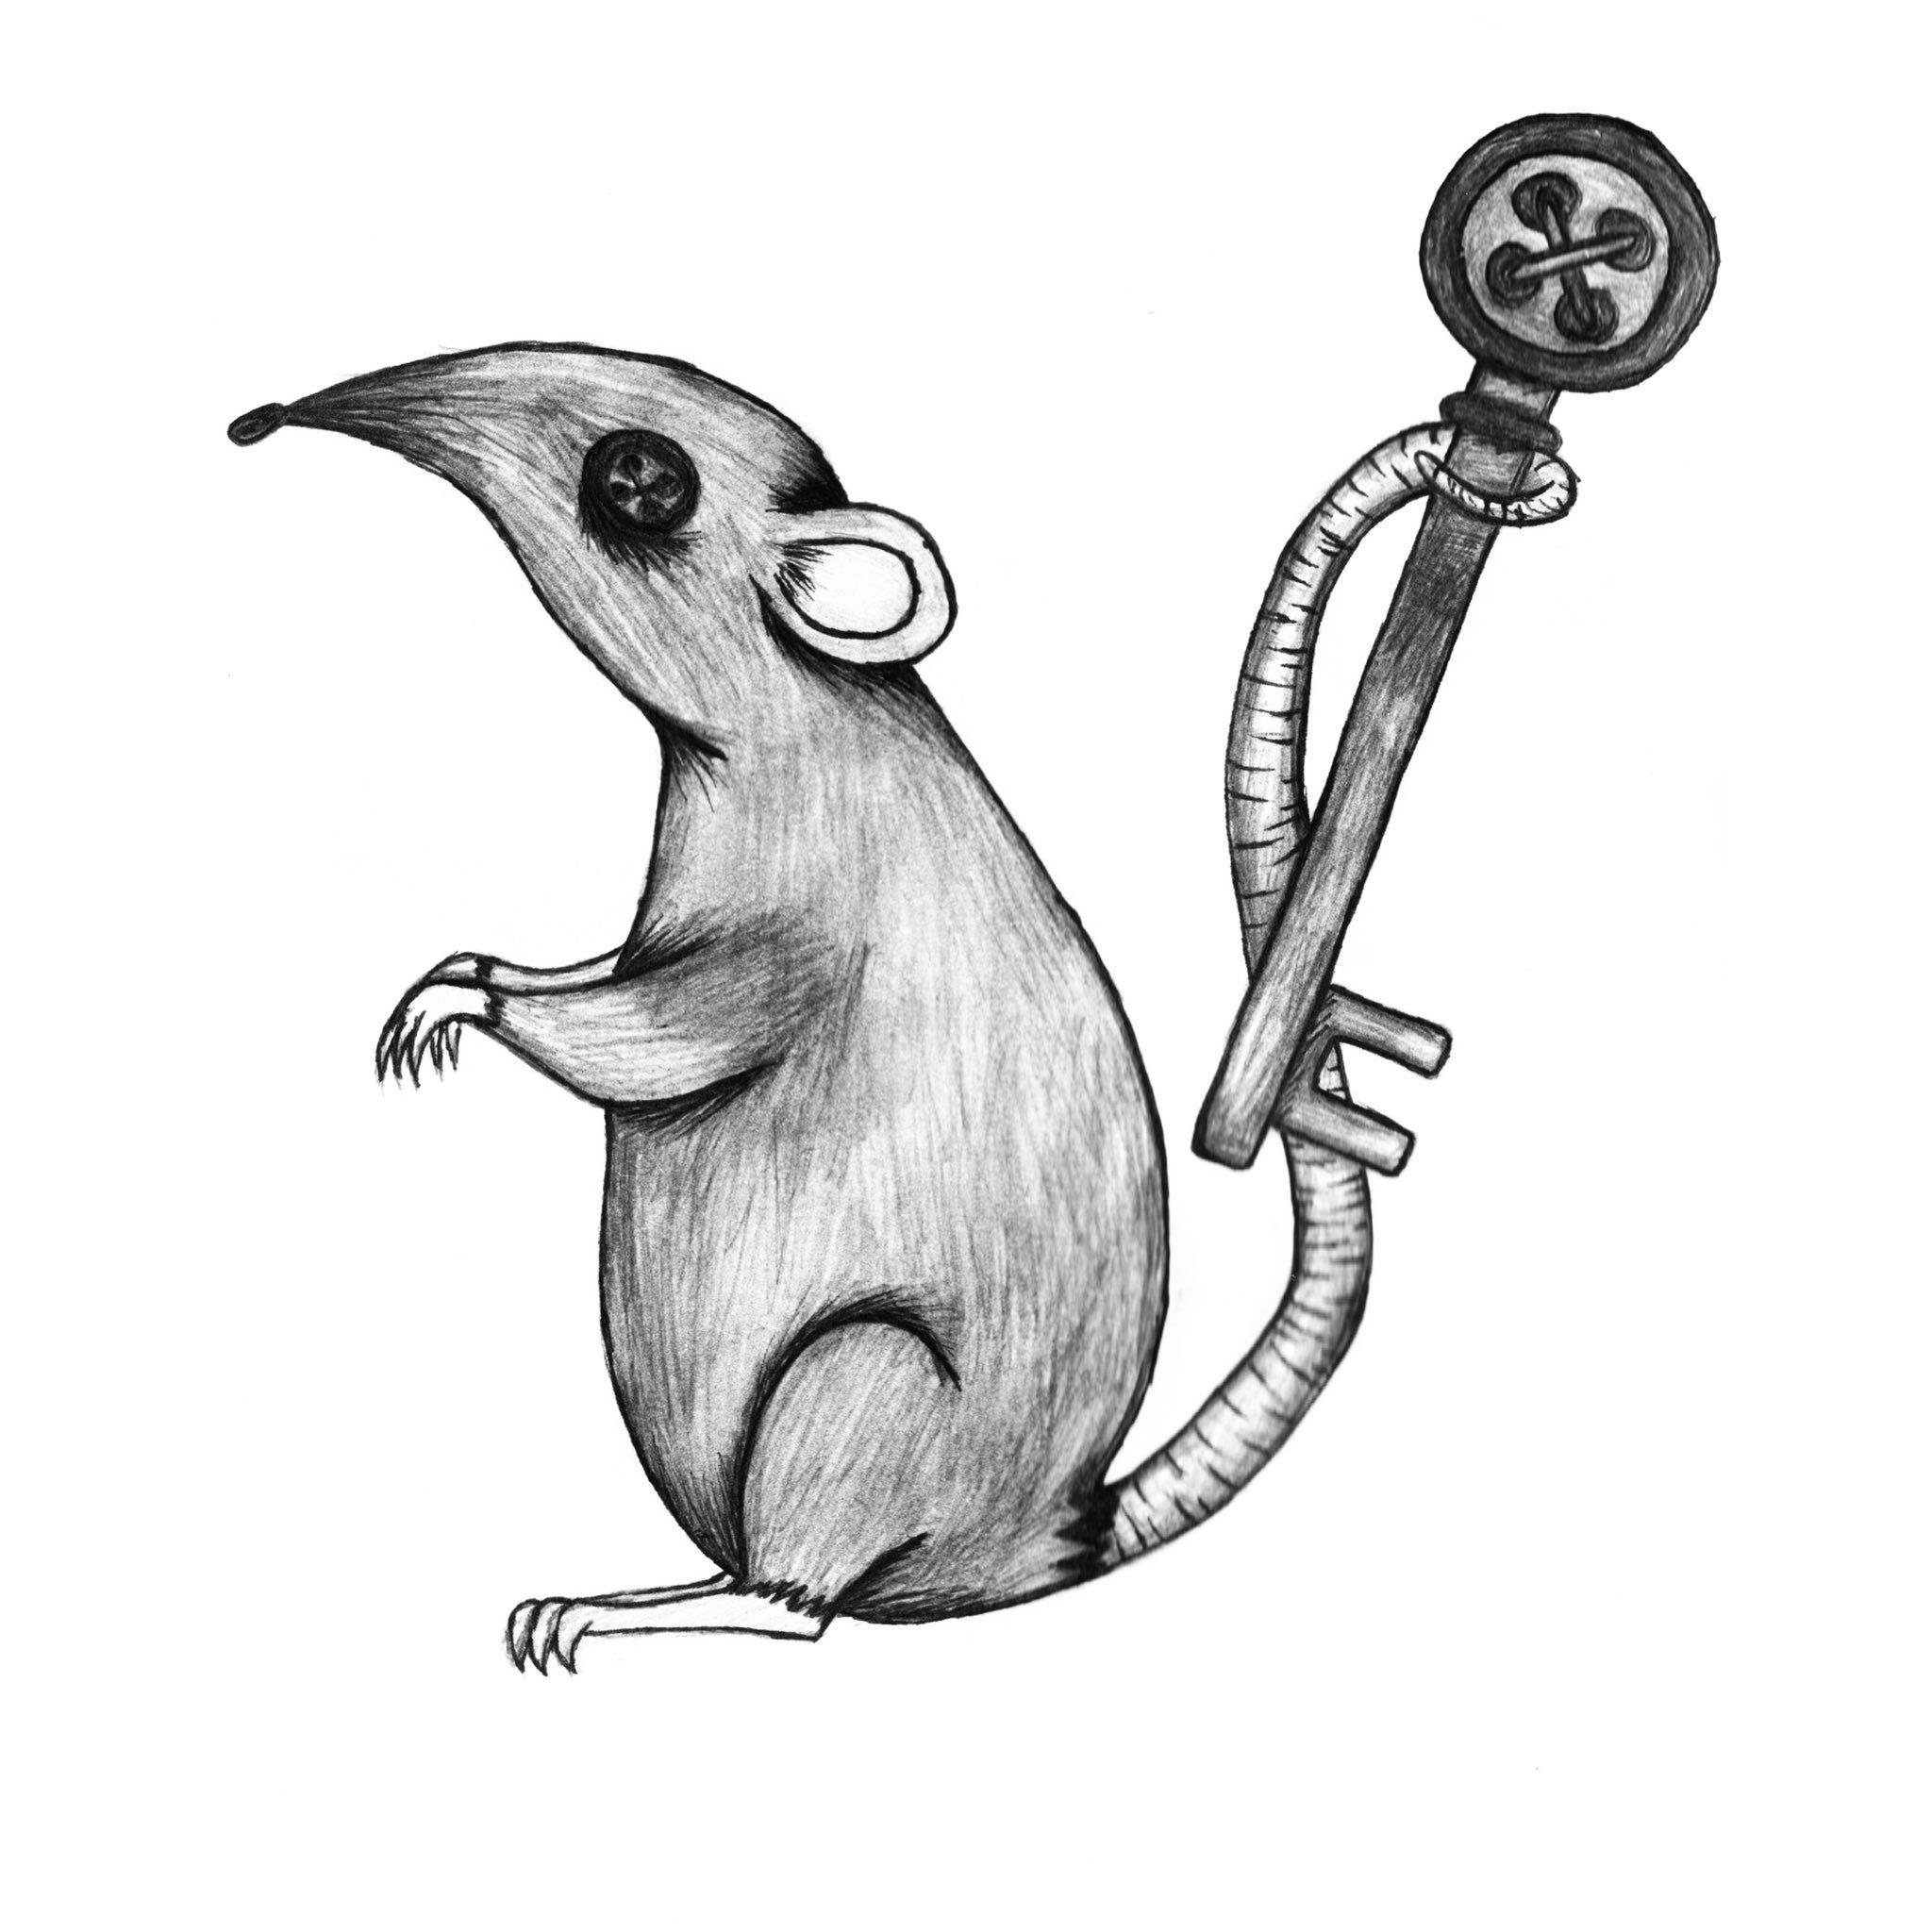 Mia Hodgson On Twitter Coraline Inspired Rat Rat Rats Coraline Buttons Buttonsforeyes Buttoneyes Creepy Rattie Drawing Illustration Sketch Https T Co Dq7t4wwfjj